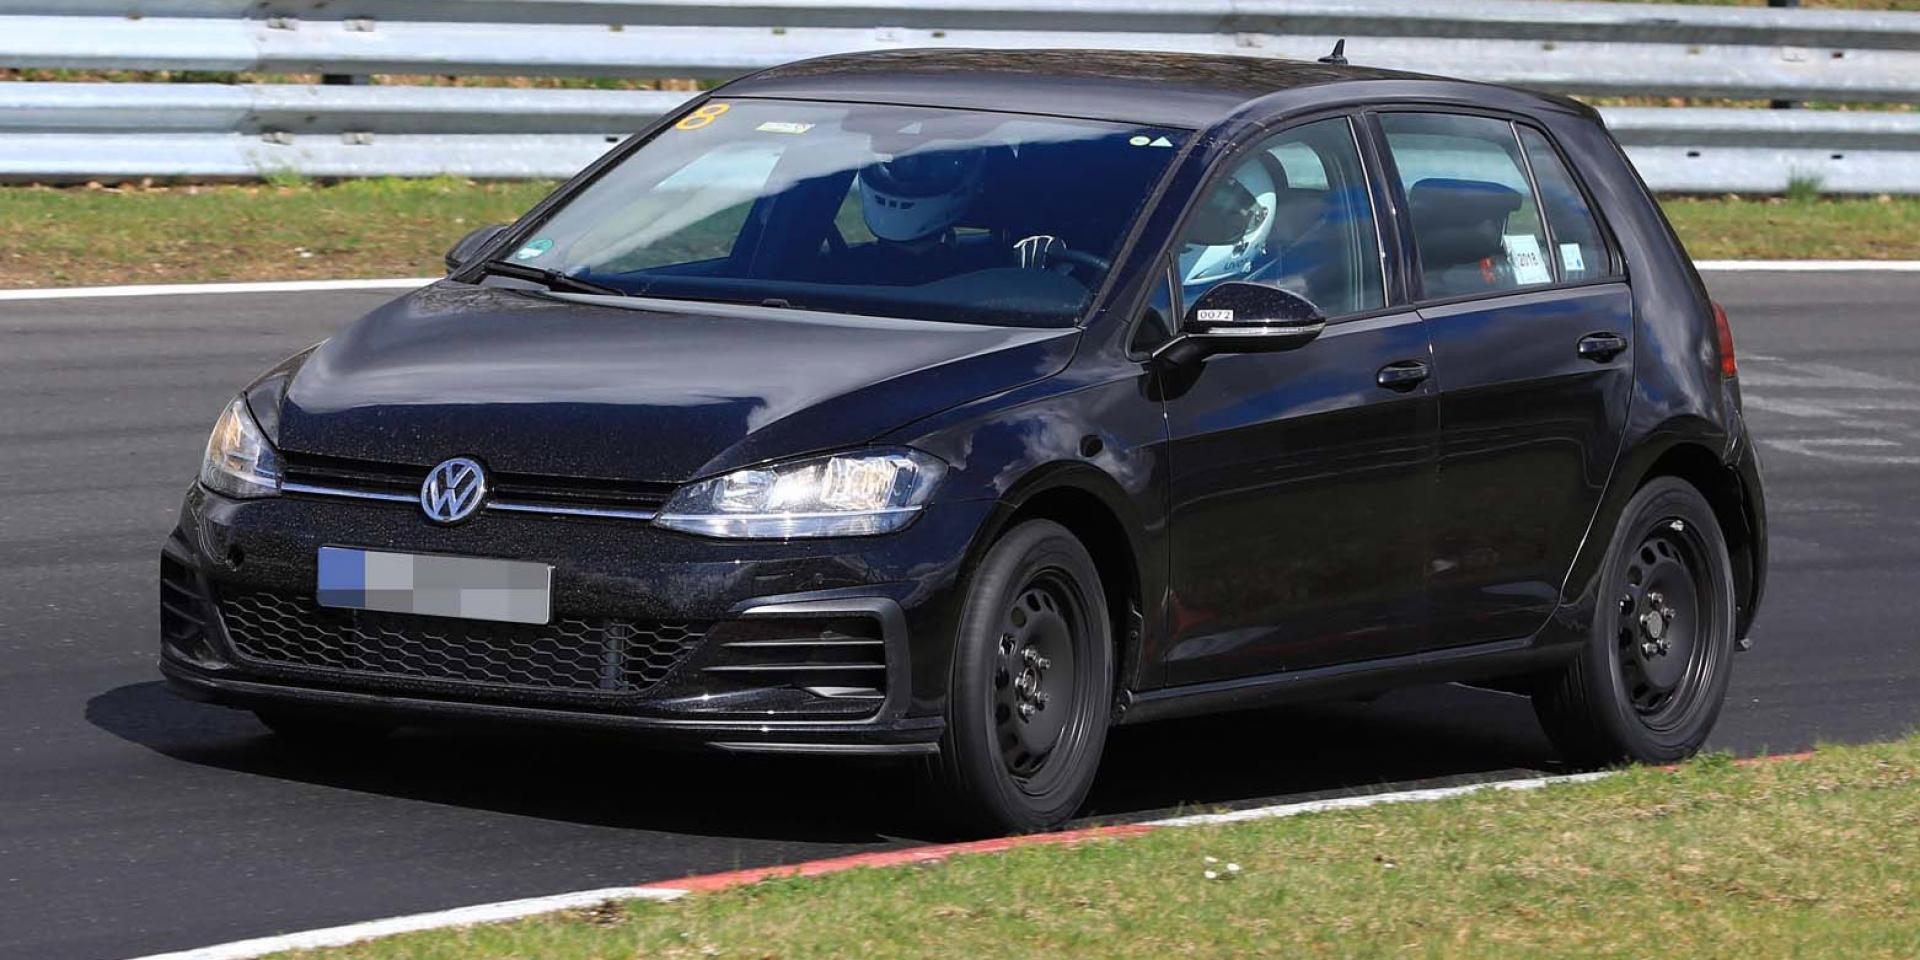 VW Golf MK8明年登場,三門、旅行車款疑似取消!